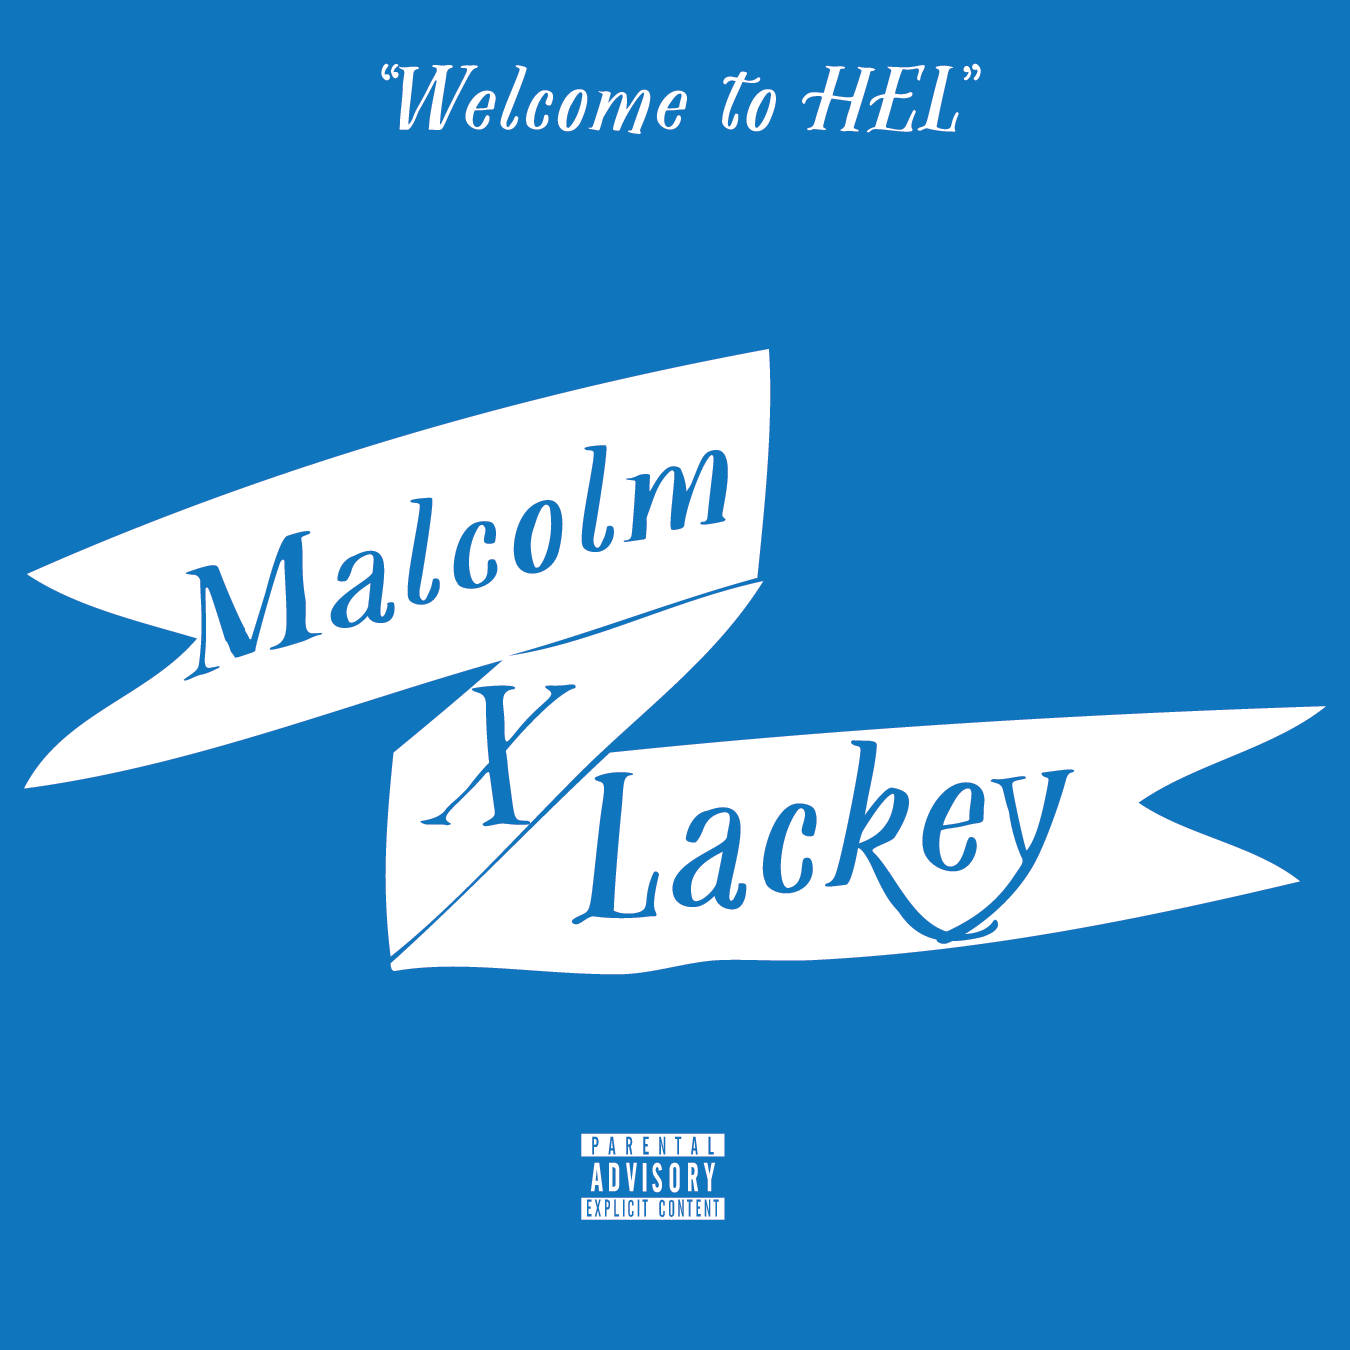 malcom x, lackey, blac chyna, california, westcoast, lackey, los angeles, season tunes,